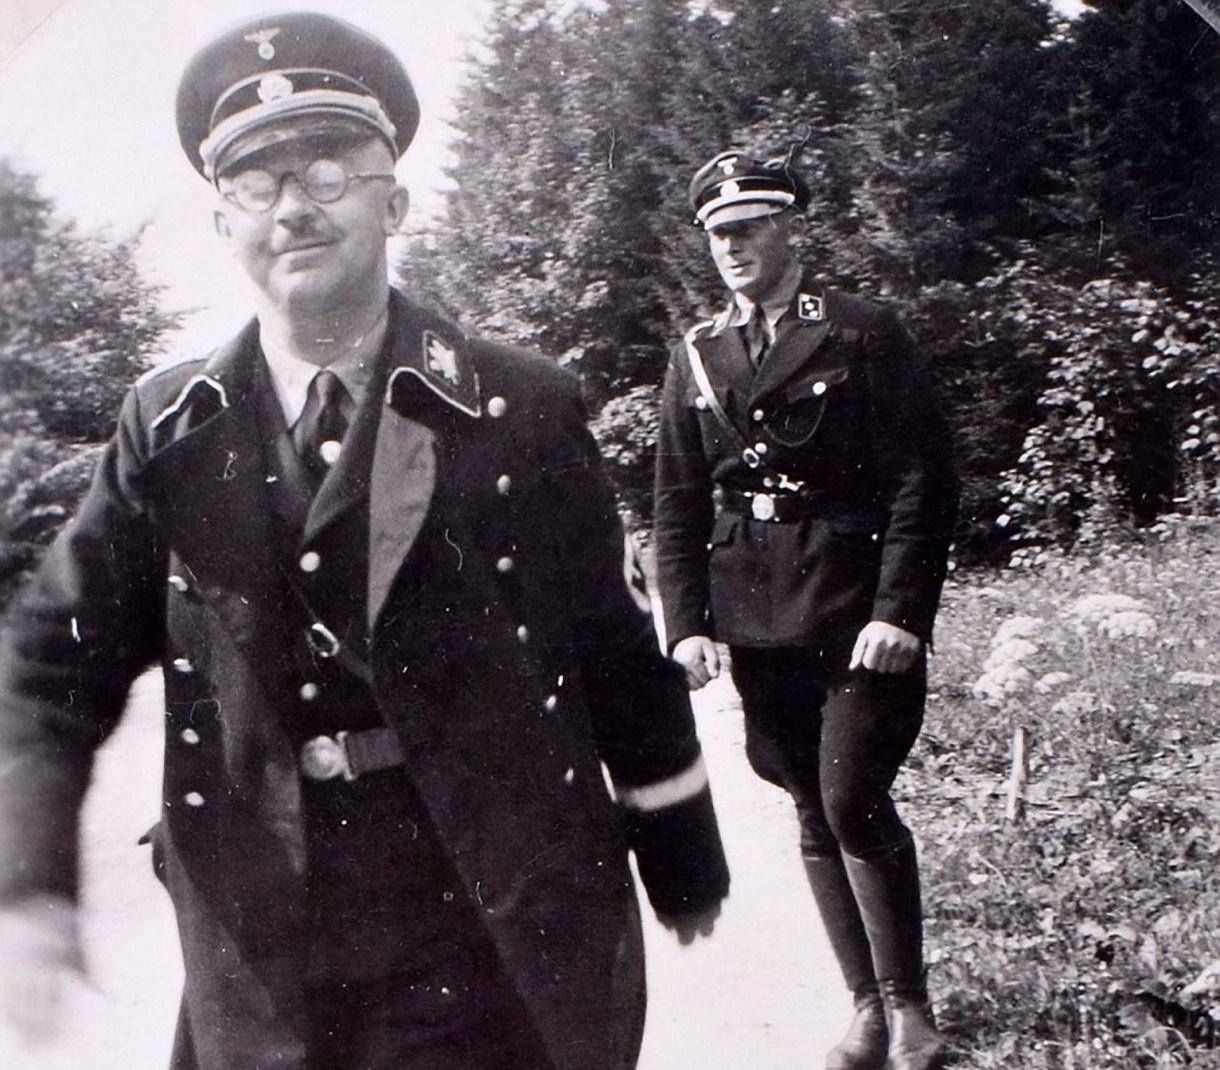 Heinrich Himmler, el brutal arquitecto del Holocausto (C&T Acuctions/BNPS)